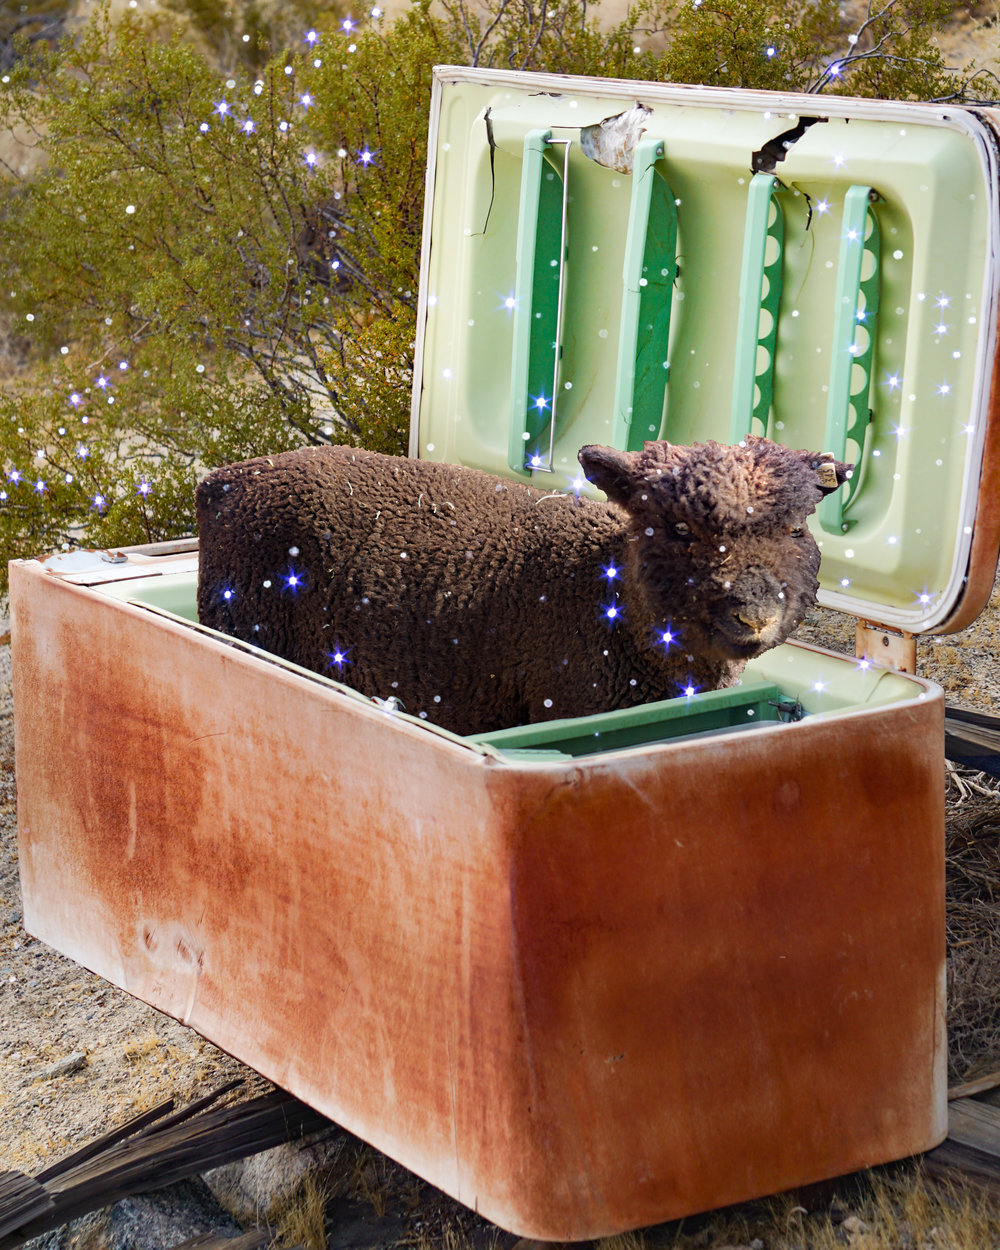 Sheep in an Ice Box